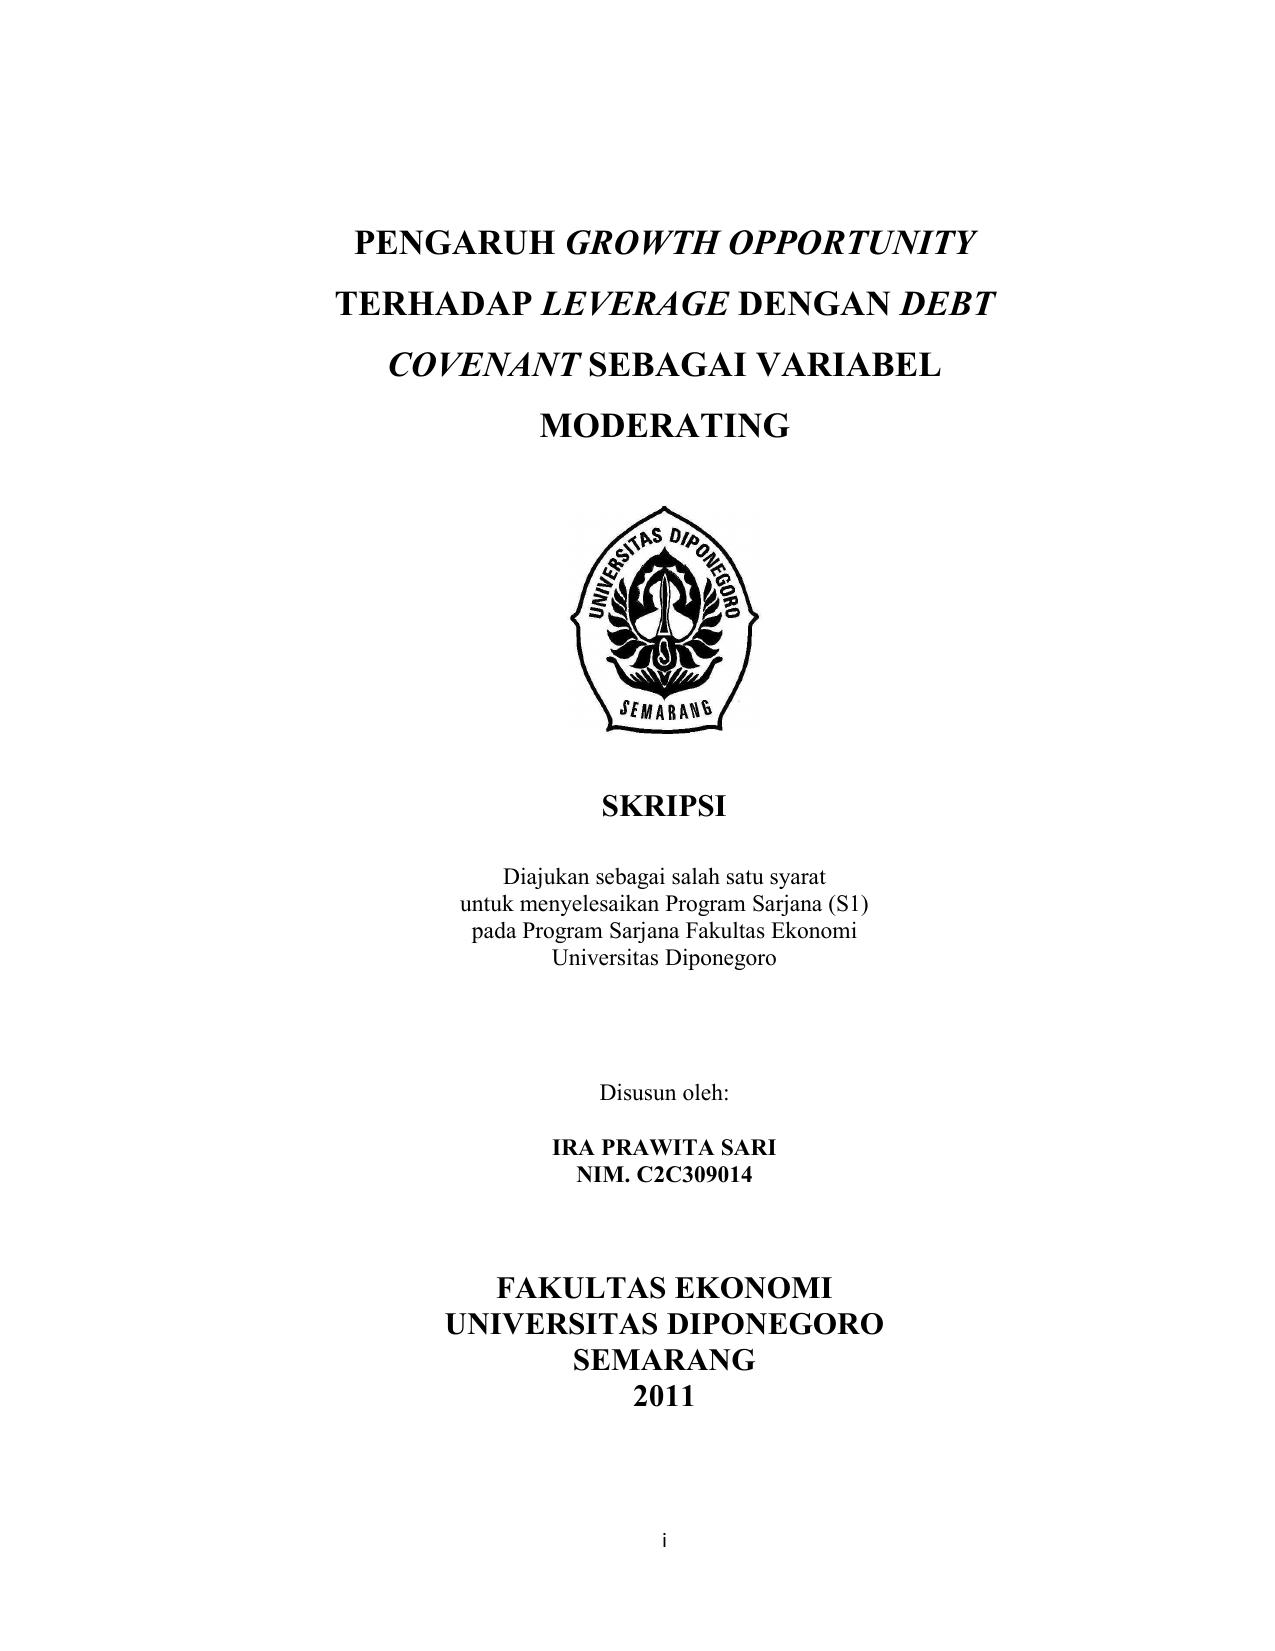 Skripsi Full Text Eprints Undip